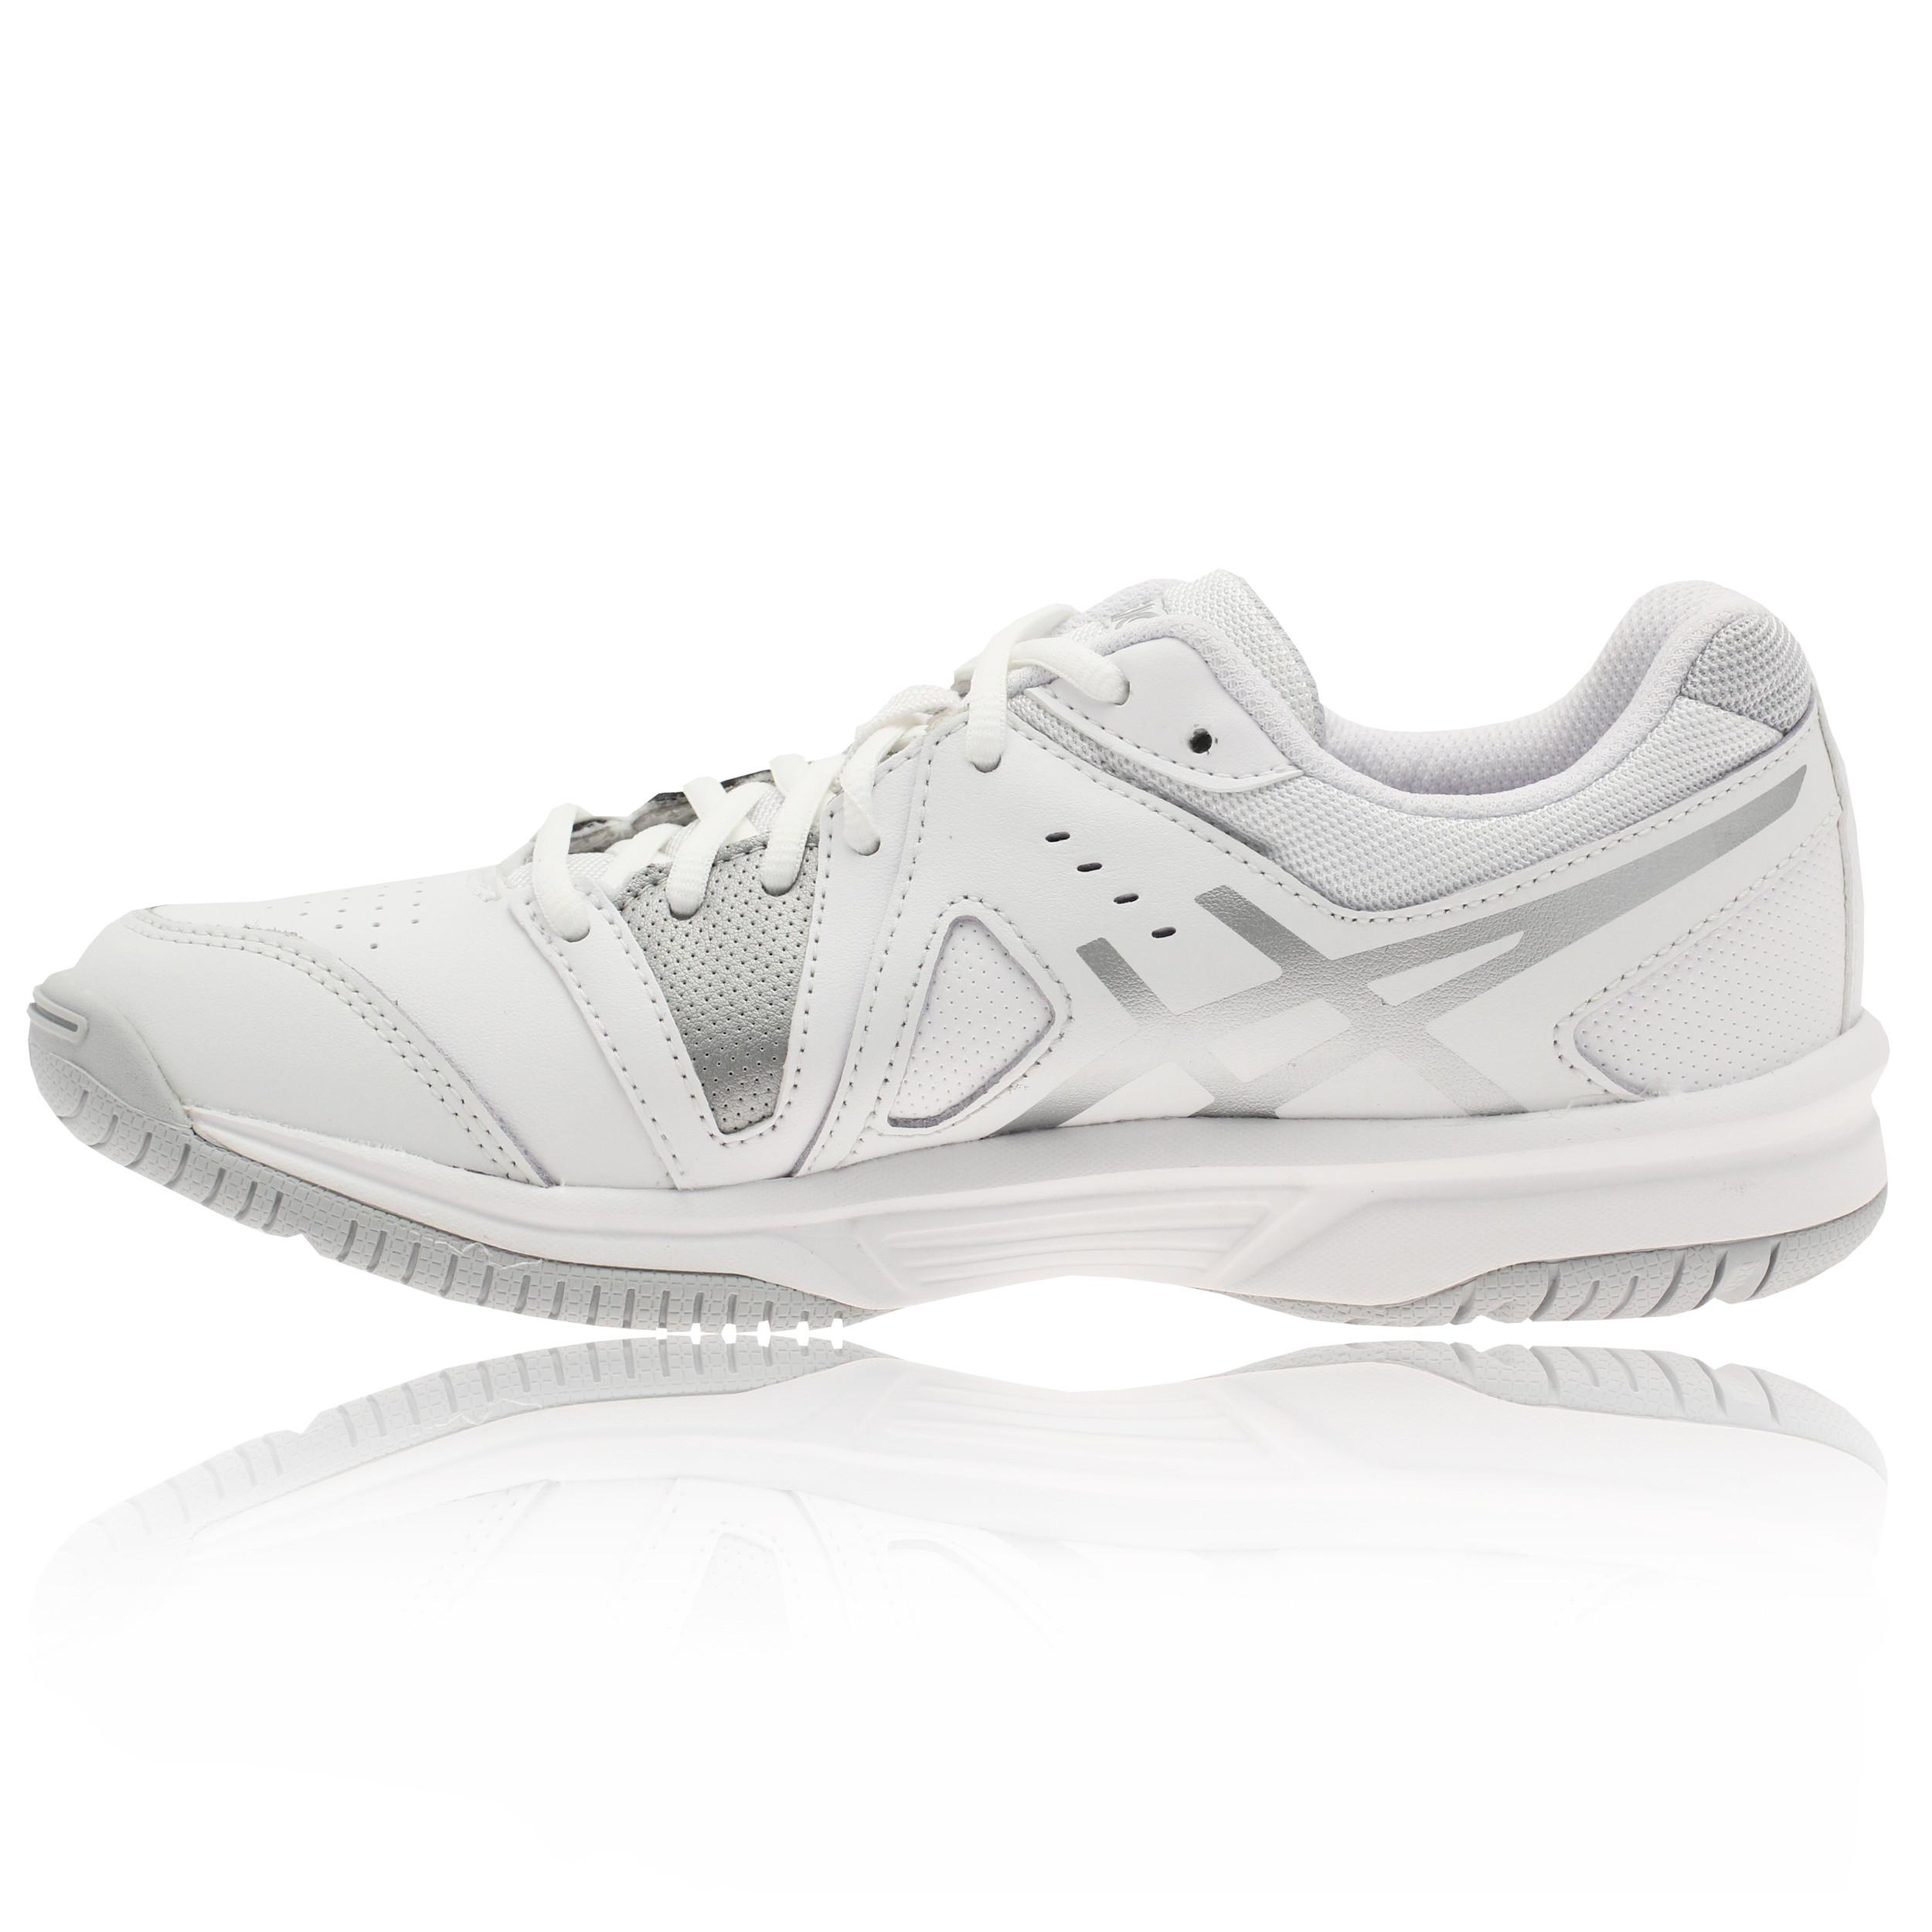 ASICS GEL-GAMEPOINT GS Junior Tennis Shoes